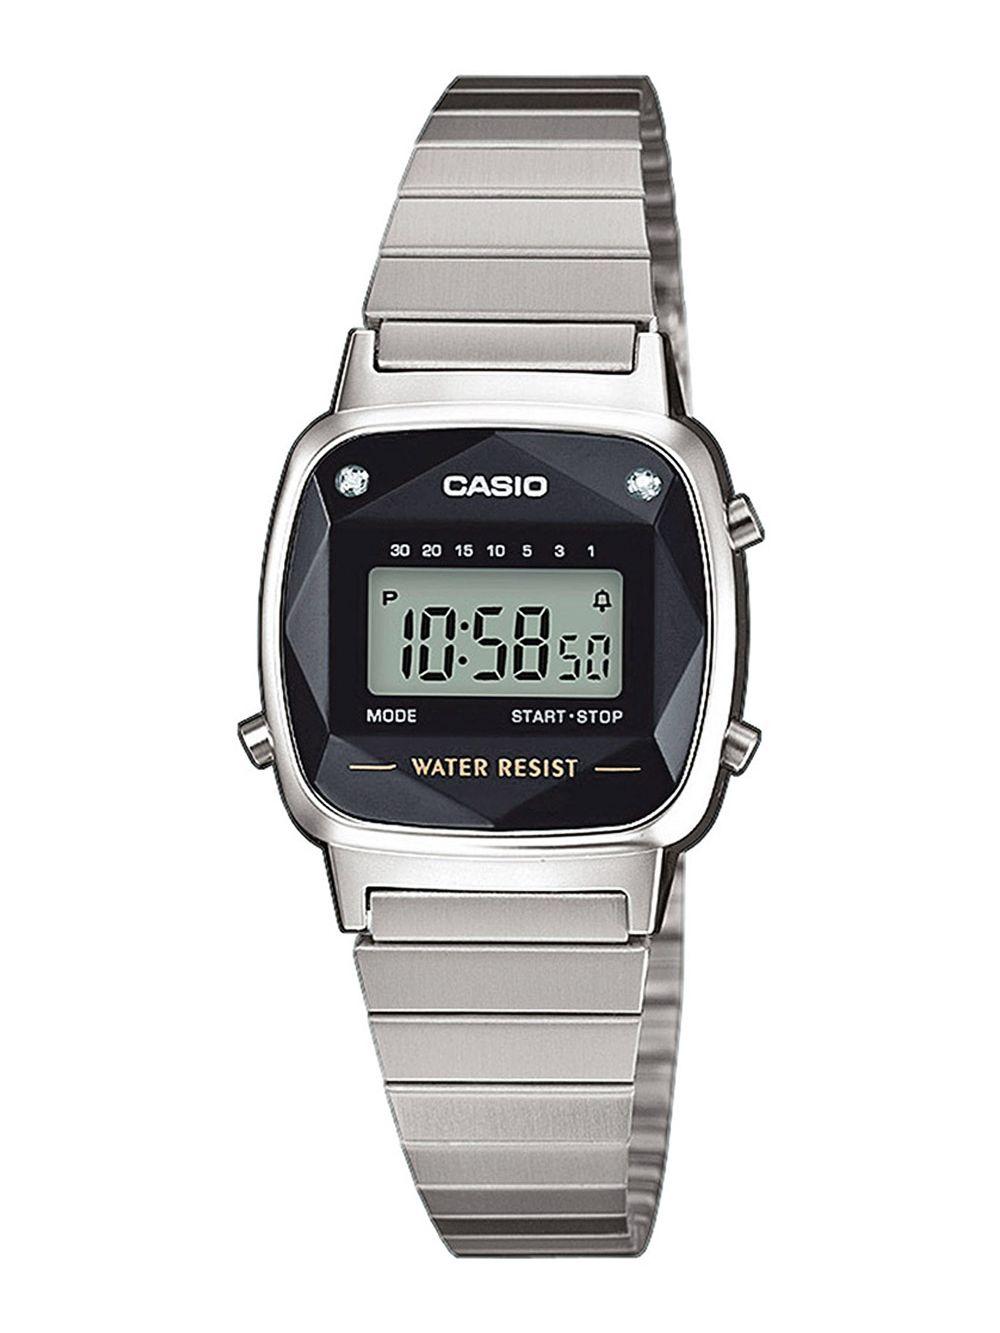 fec85fbcd3fb CASIO Vintage Ladies´ Digital Watch LA670WEAD-1EF • uhrcenter